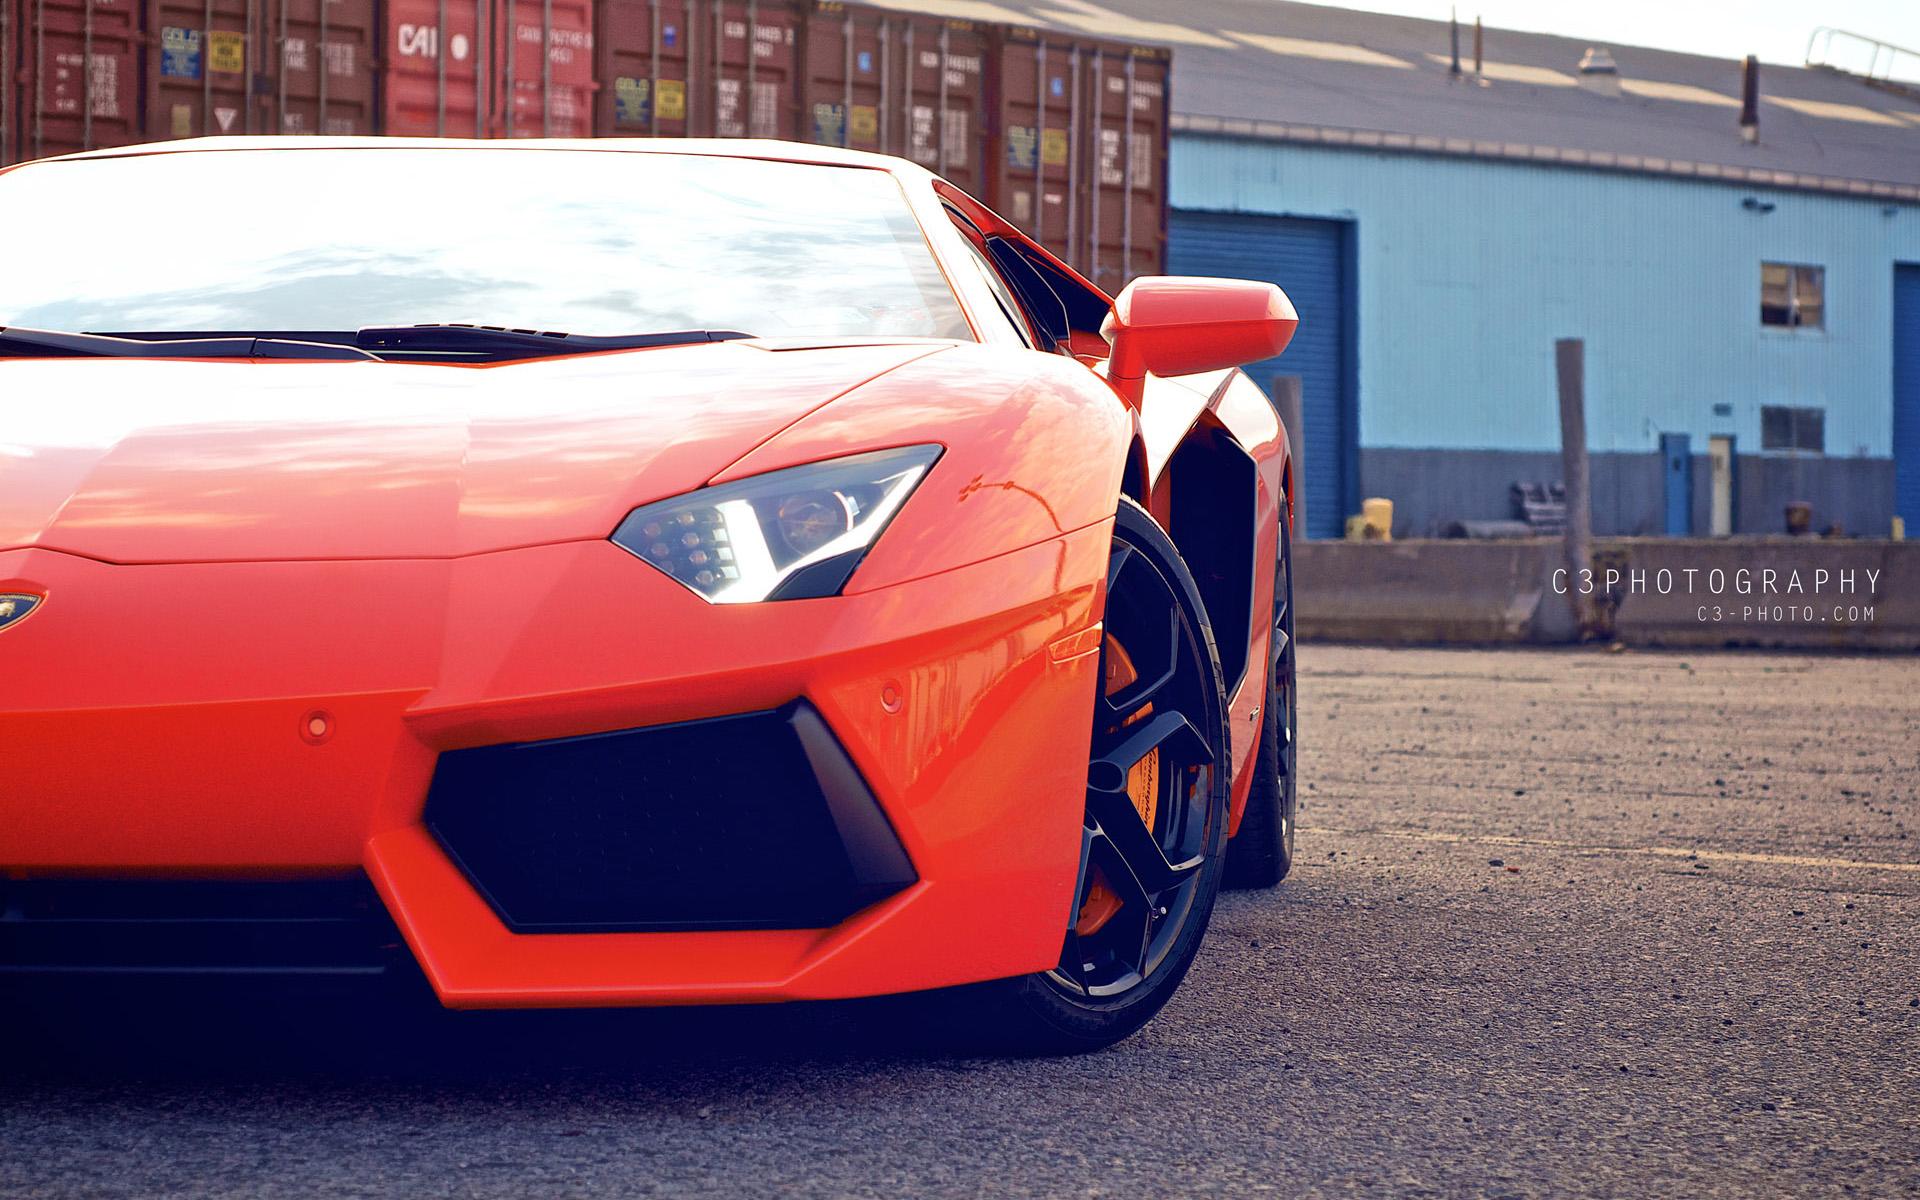 New Red Lamborghini Aventador Wallpapers Hd Wallpapers